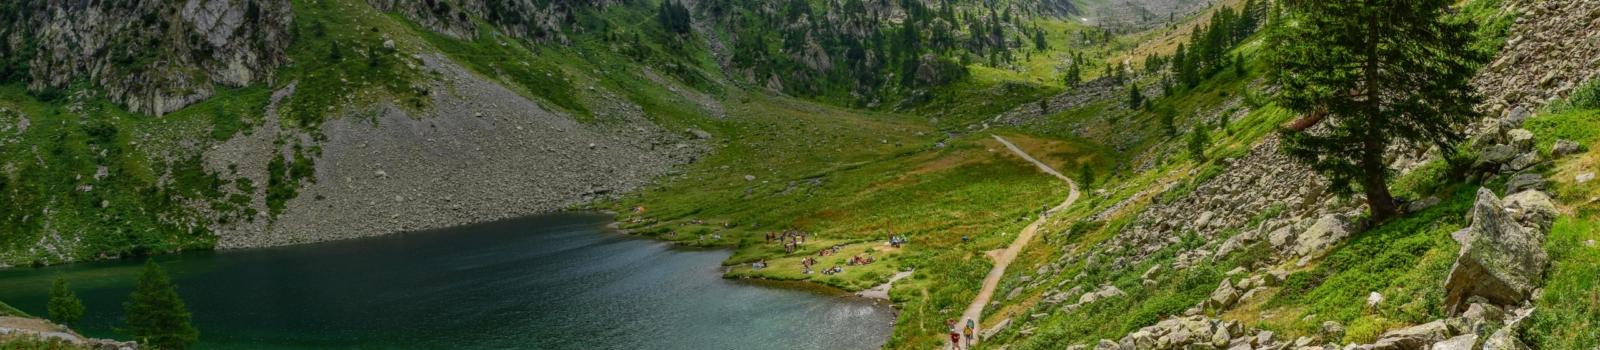 Bike-Hike-Tour Lago Lansfero, im Stura-Tal, Piemont